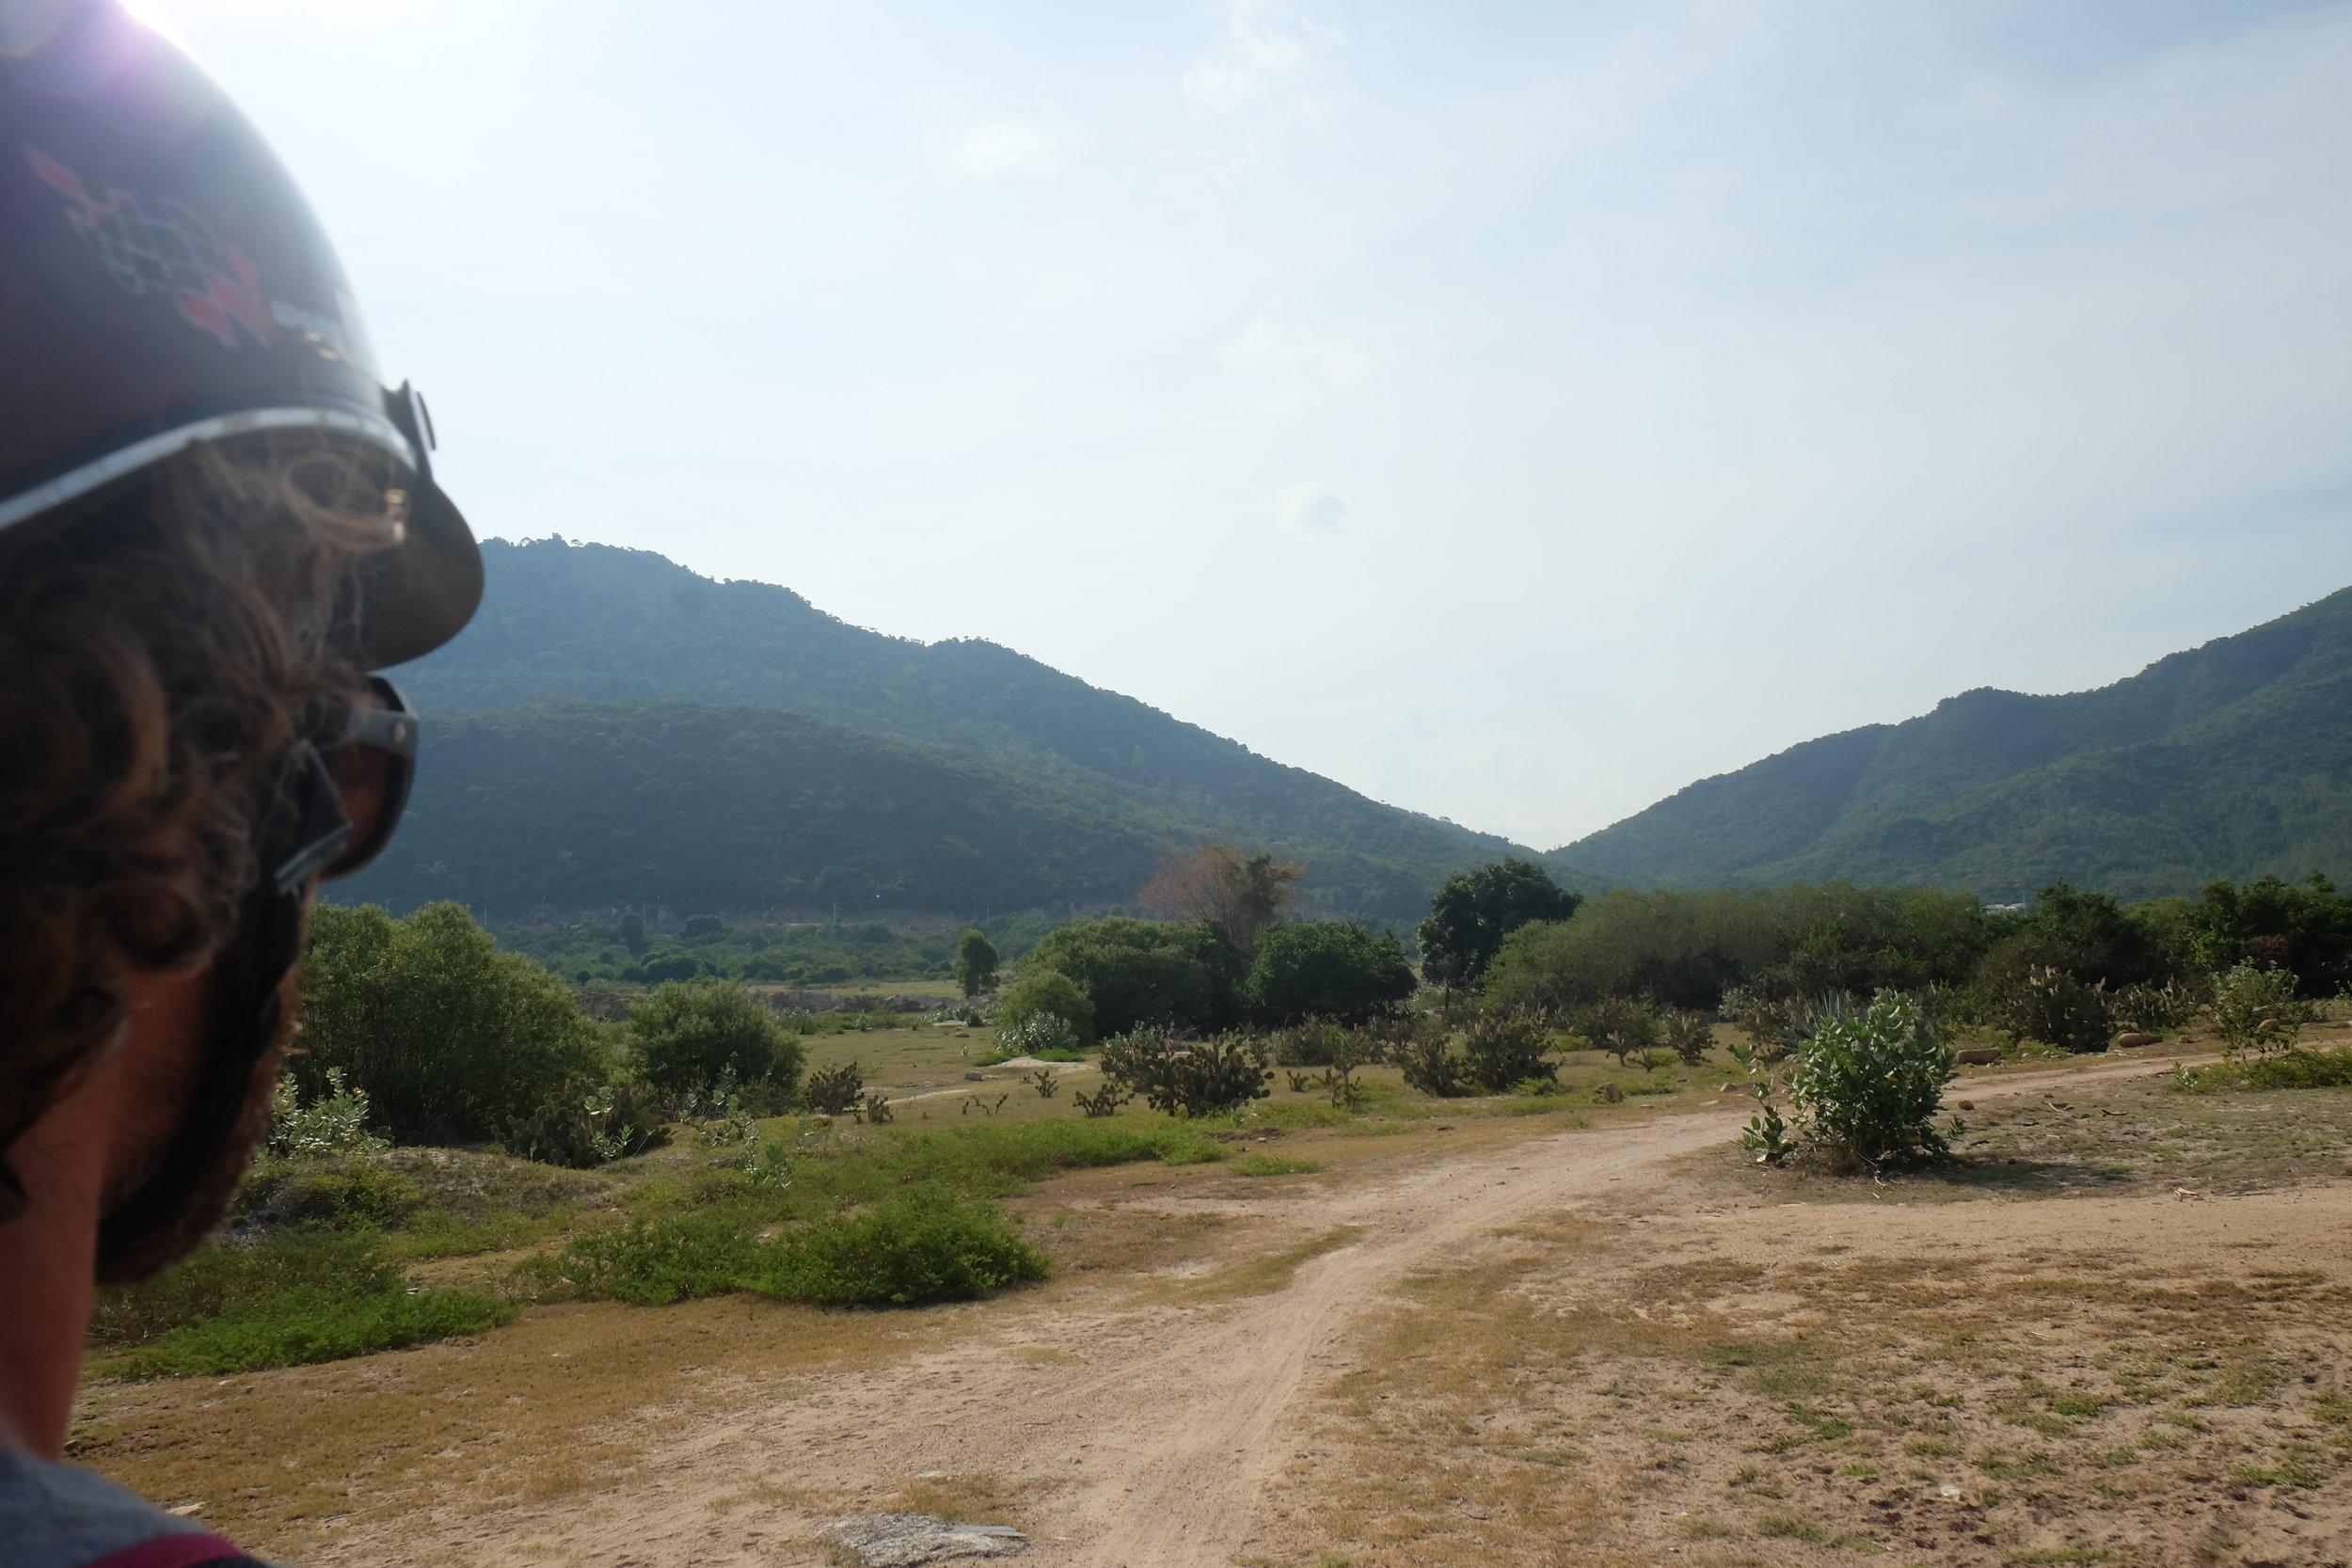 Approach to Binh Tien Beach